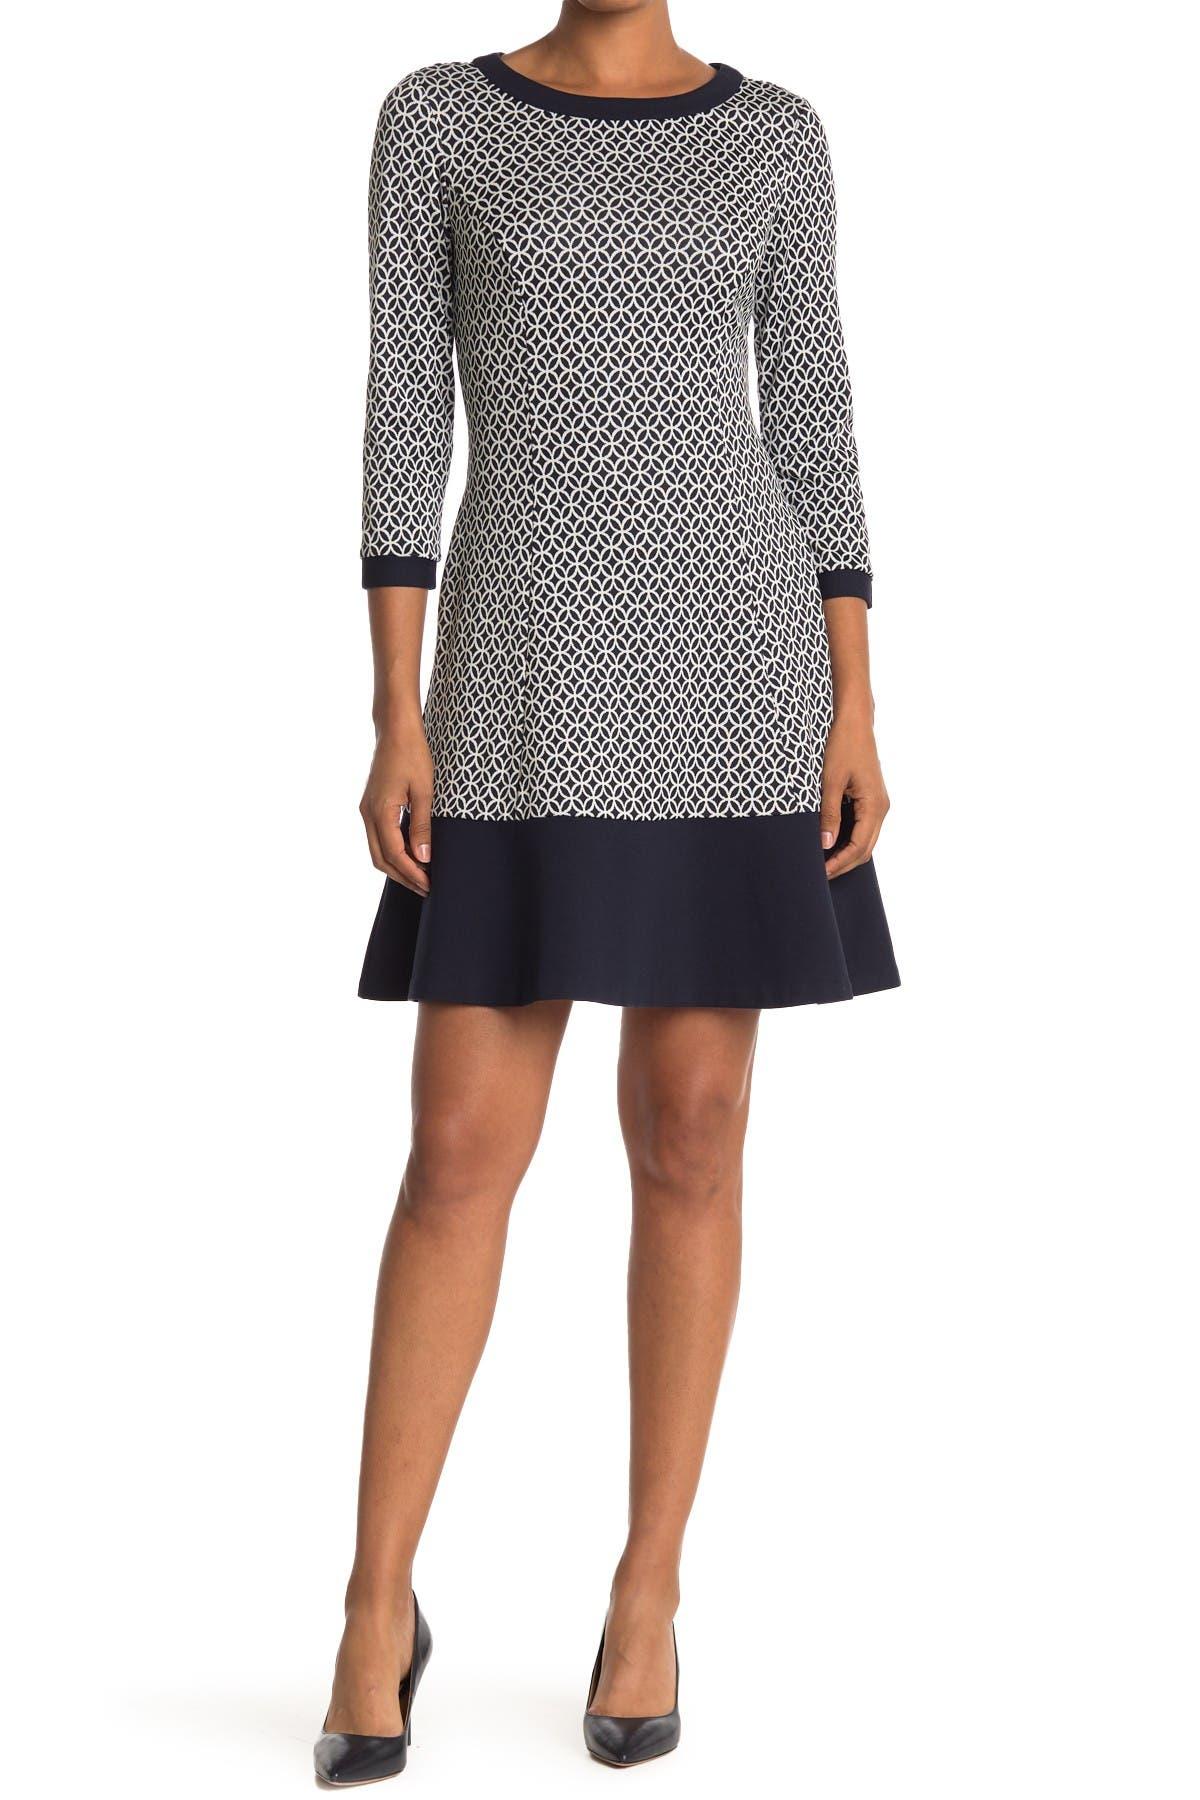 Image of Eliza J Geometric Colorblock Trim Dress